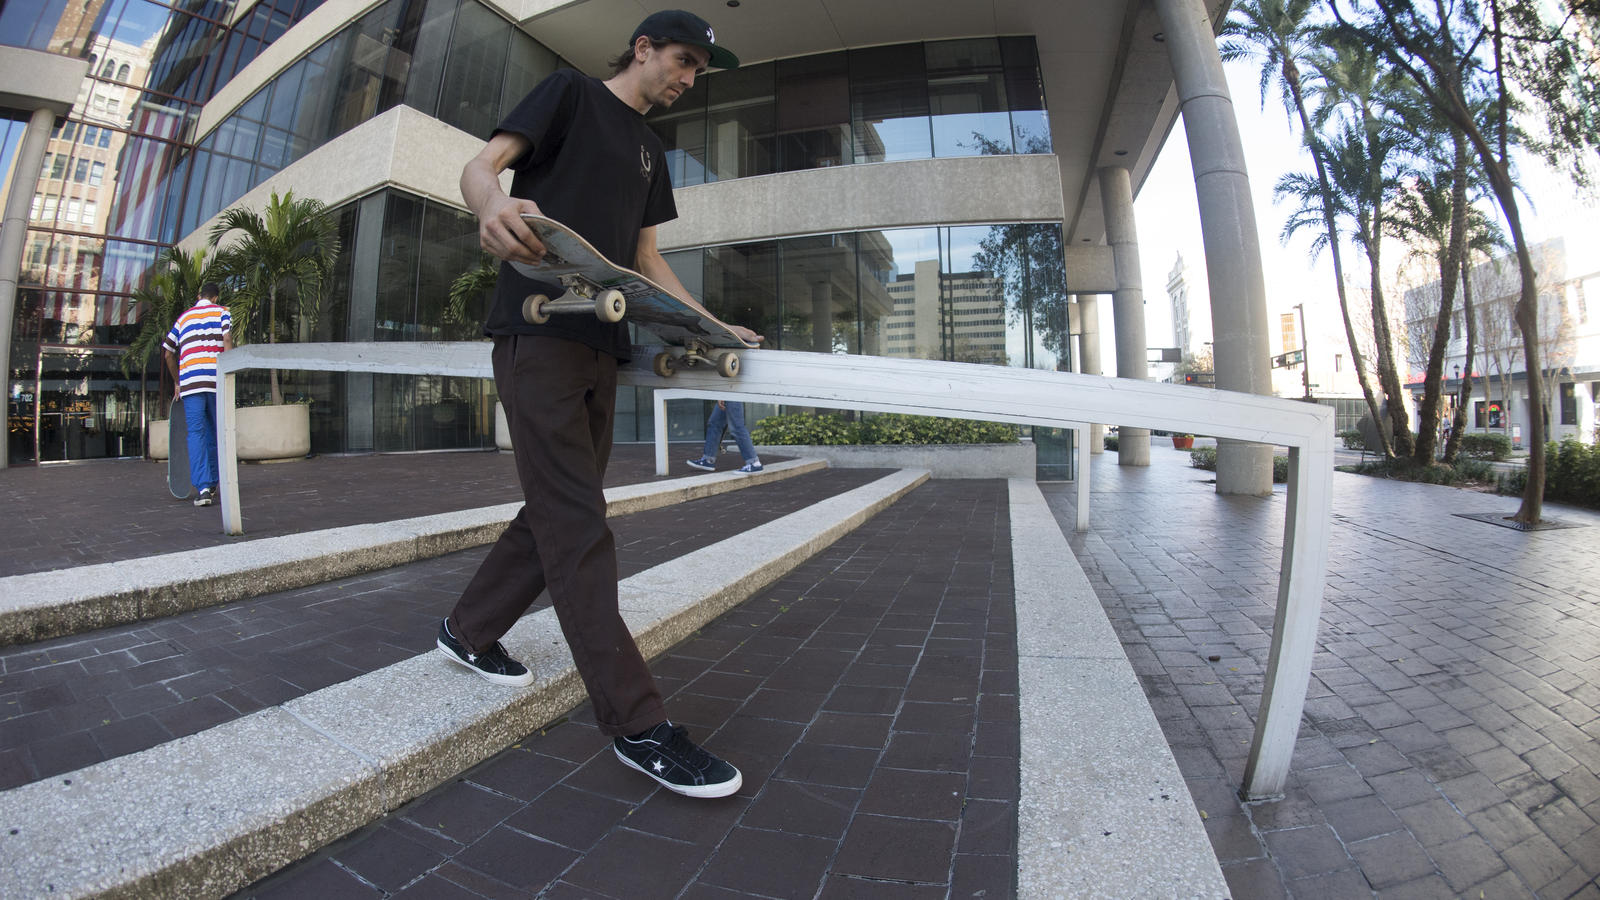 Converse Cons Announces One Star World Skate Tour - Nike News 2165004c9